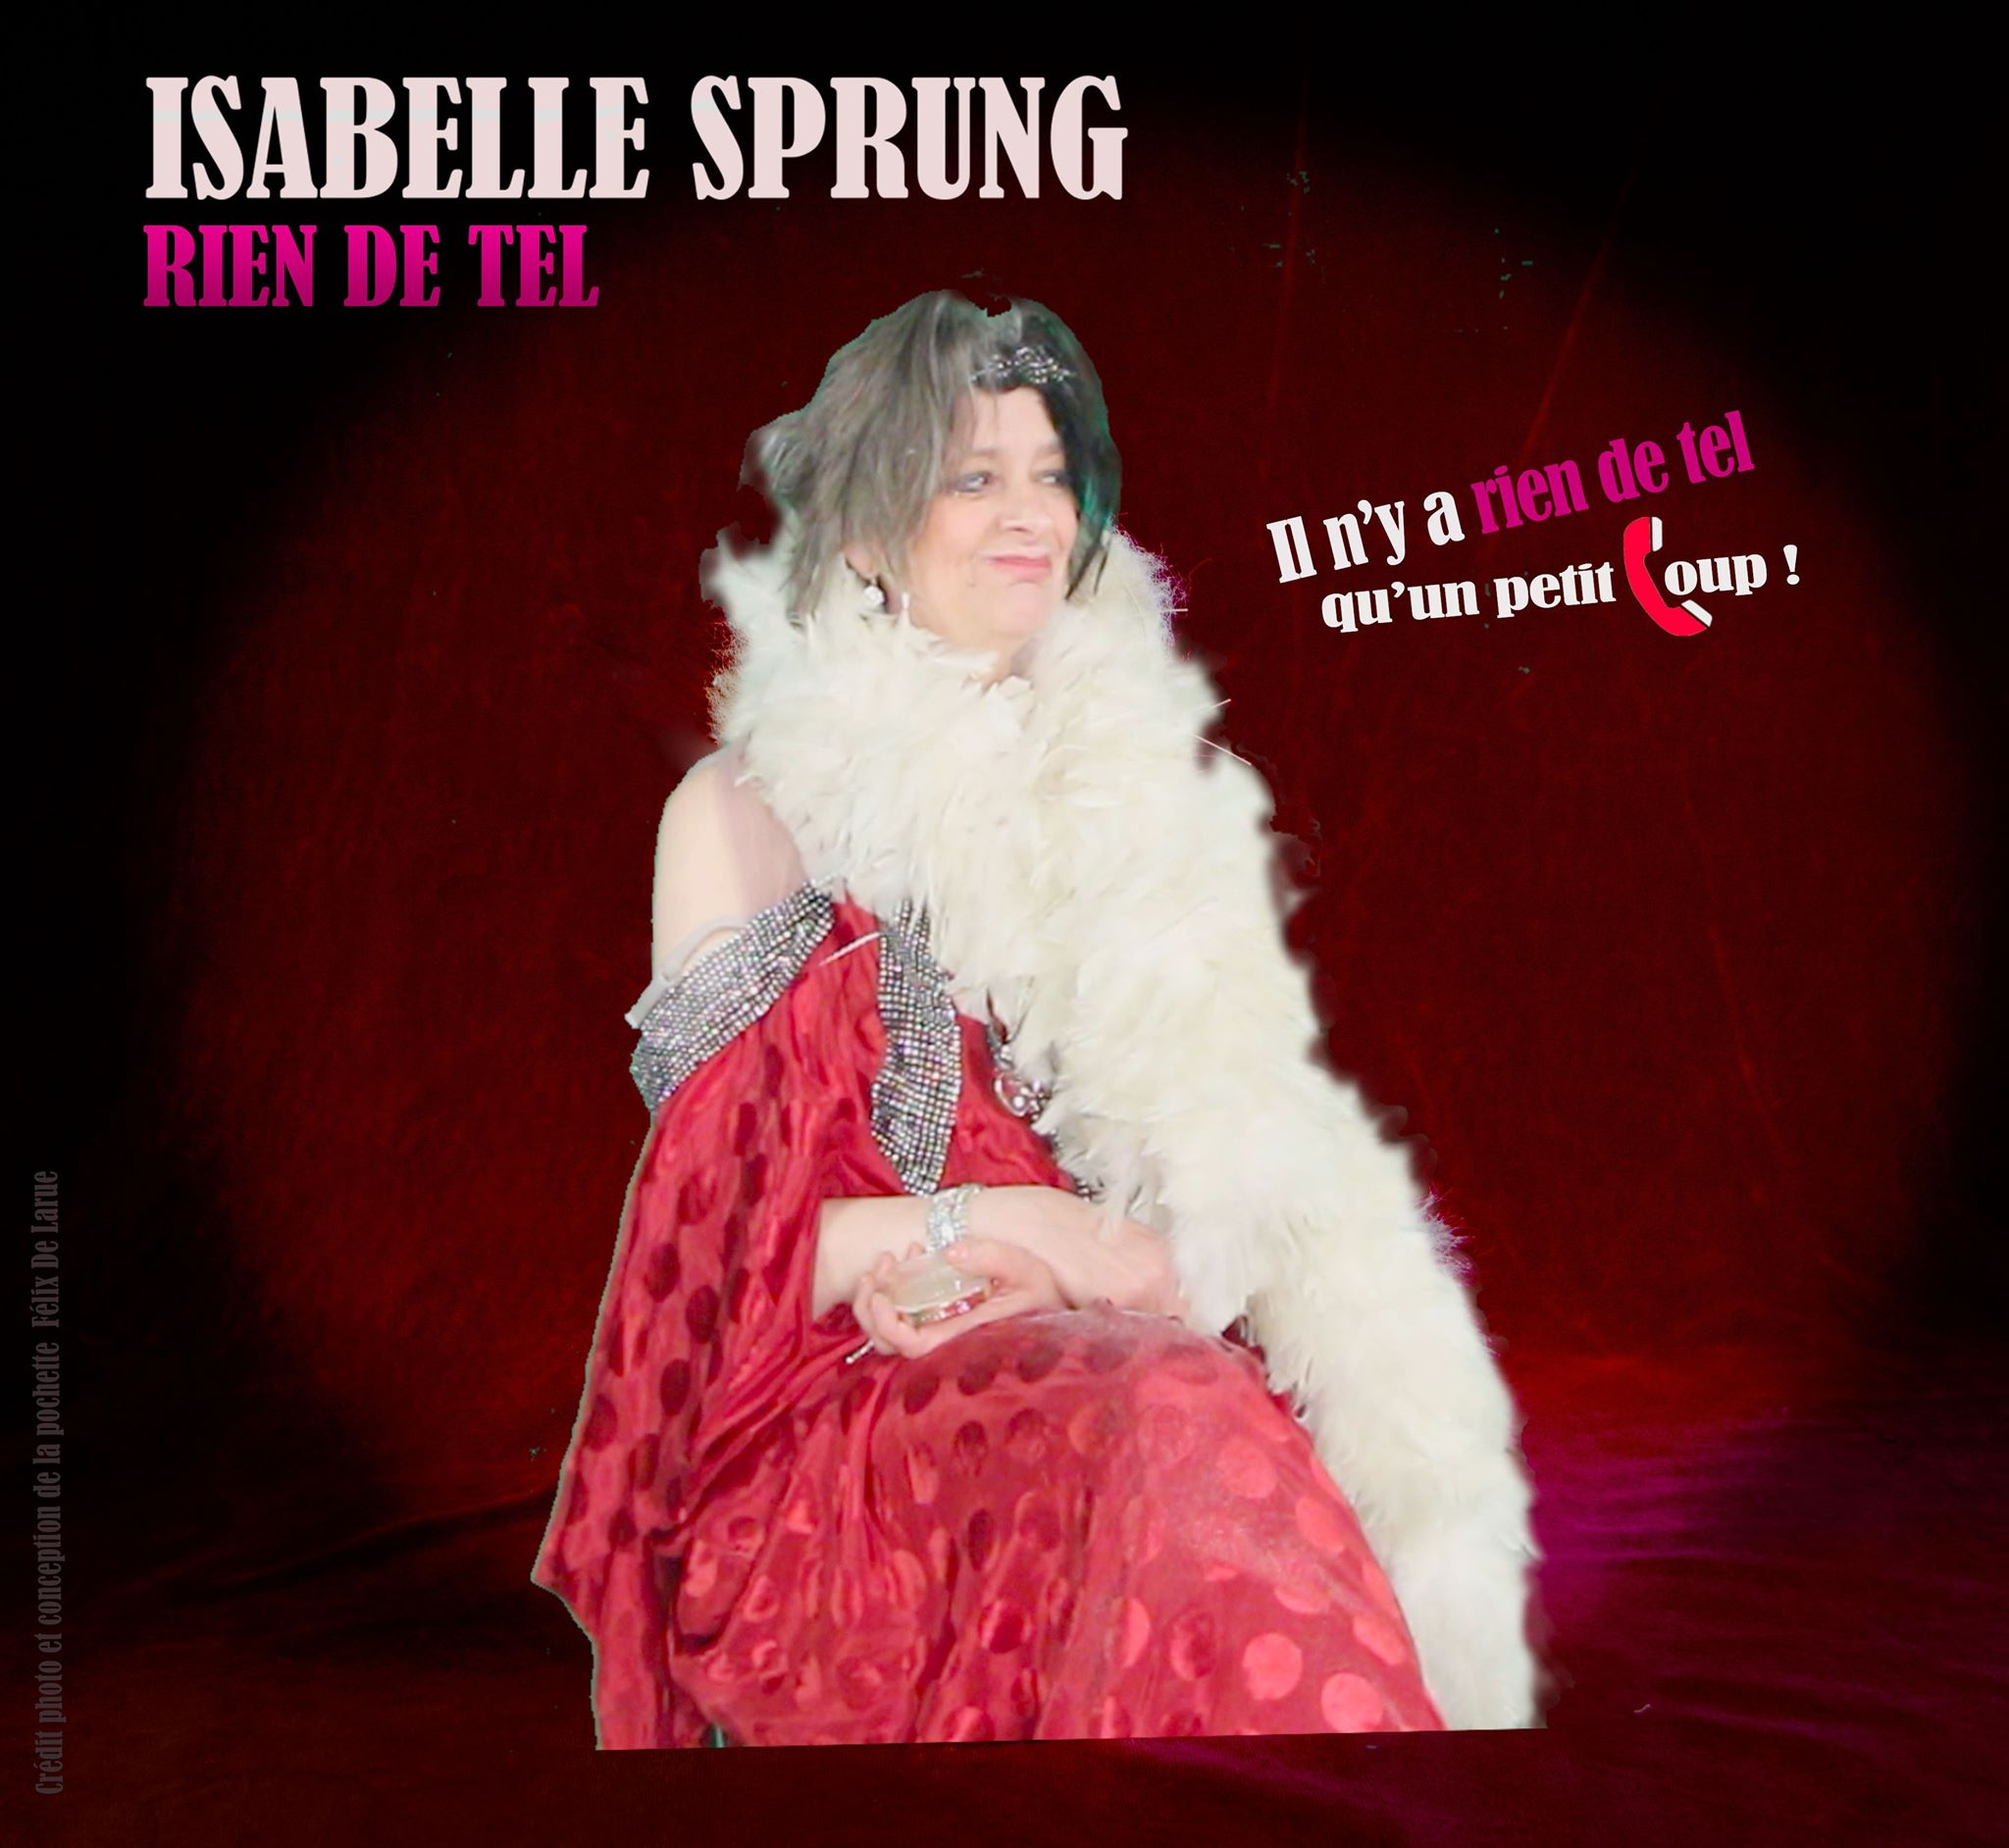 Isabelle Sprung - Rien de tel